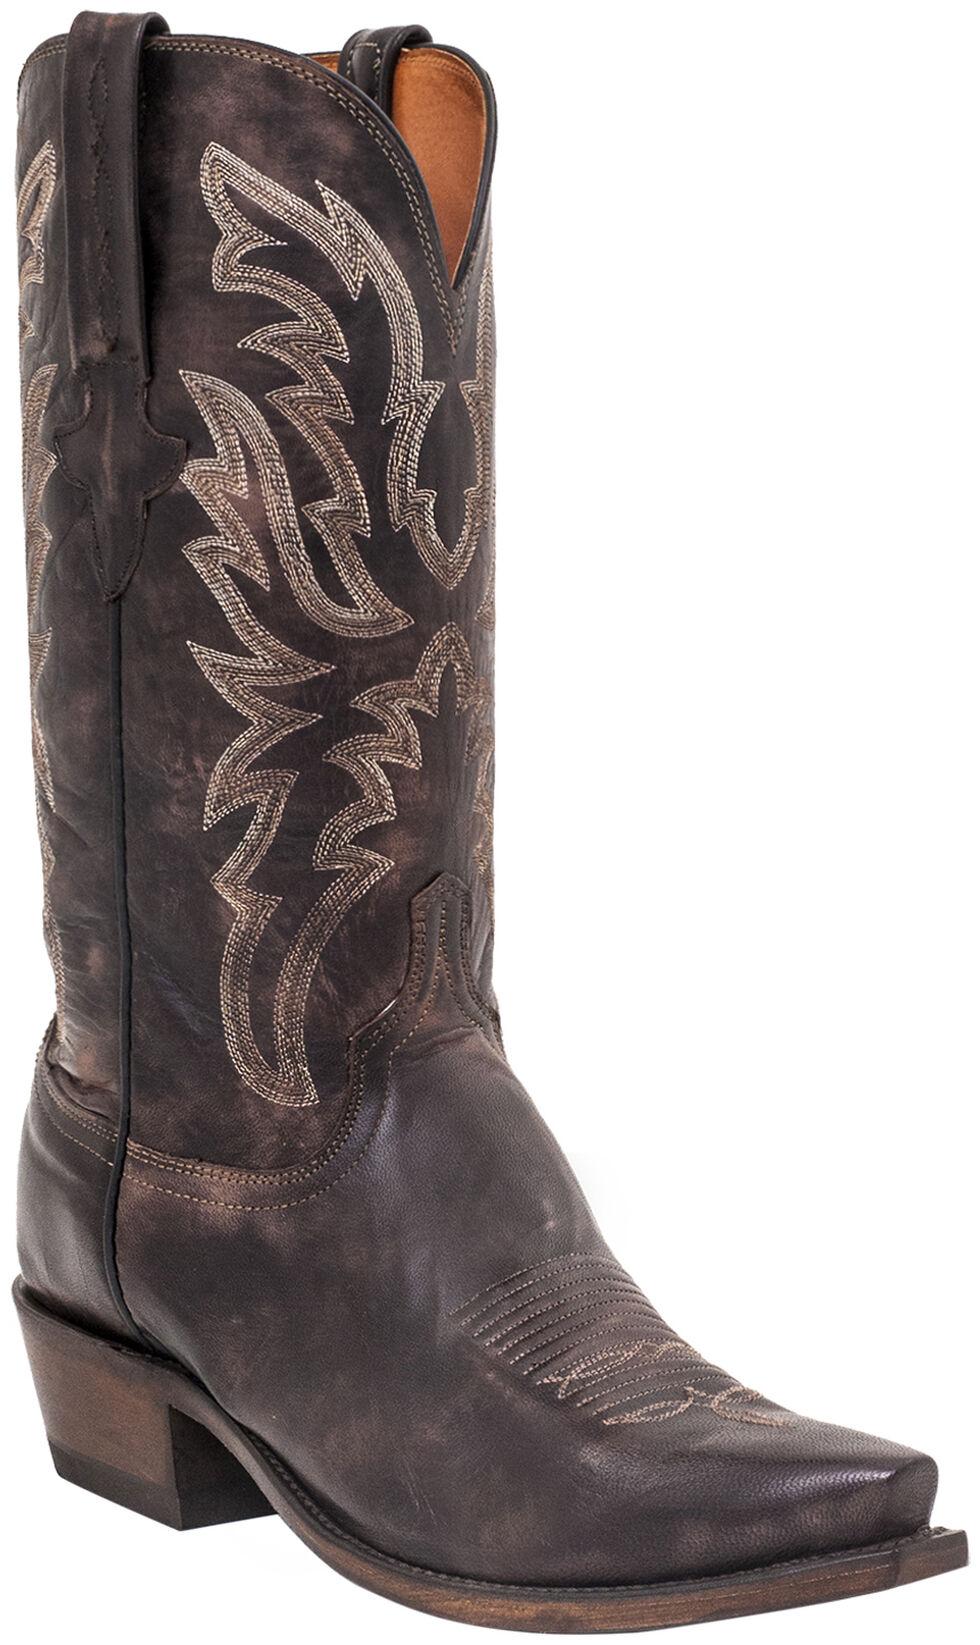 Lucchese Men's Handmade Milo Western Boots - Snip Toe , Dark Brown, hi-res